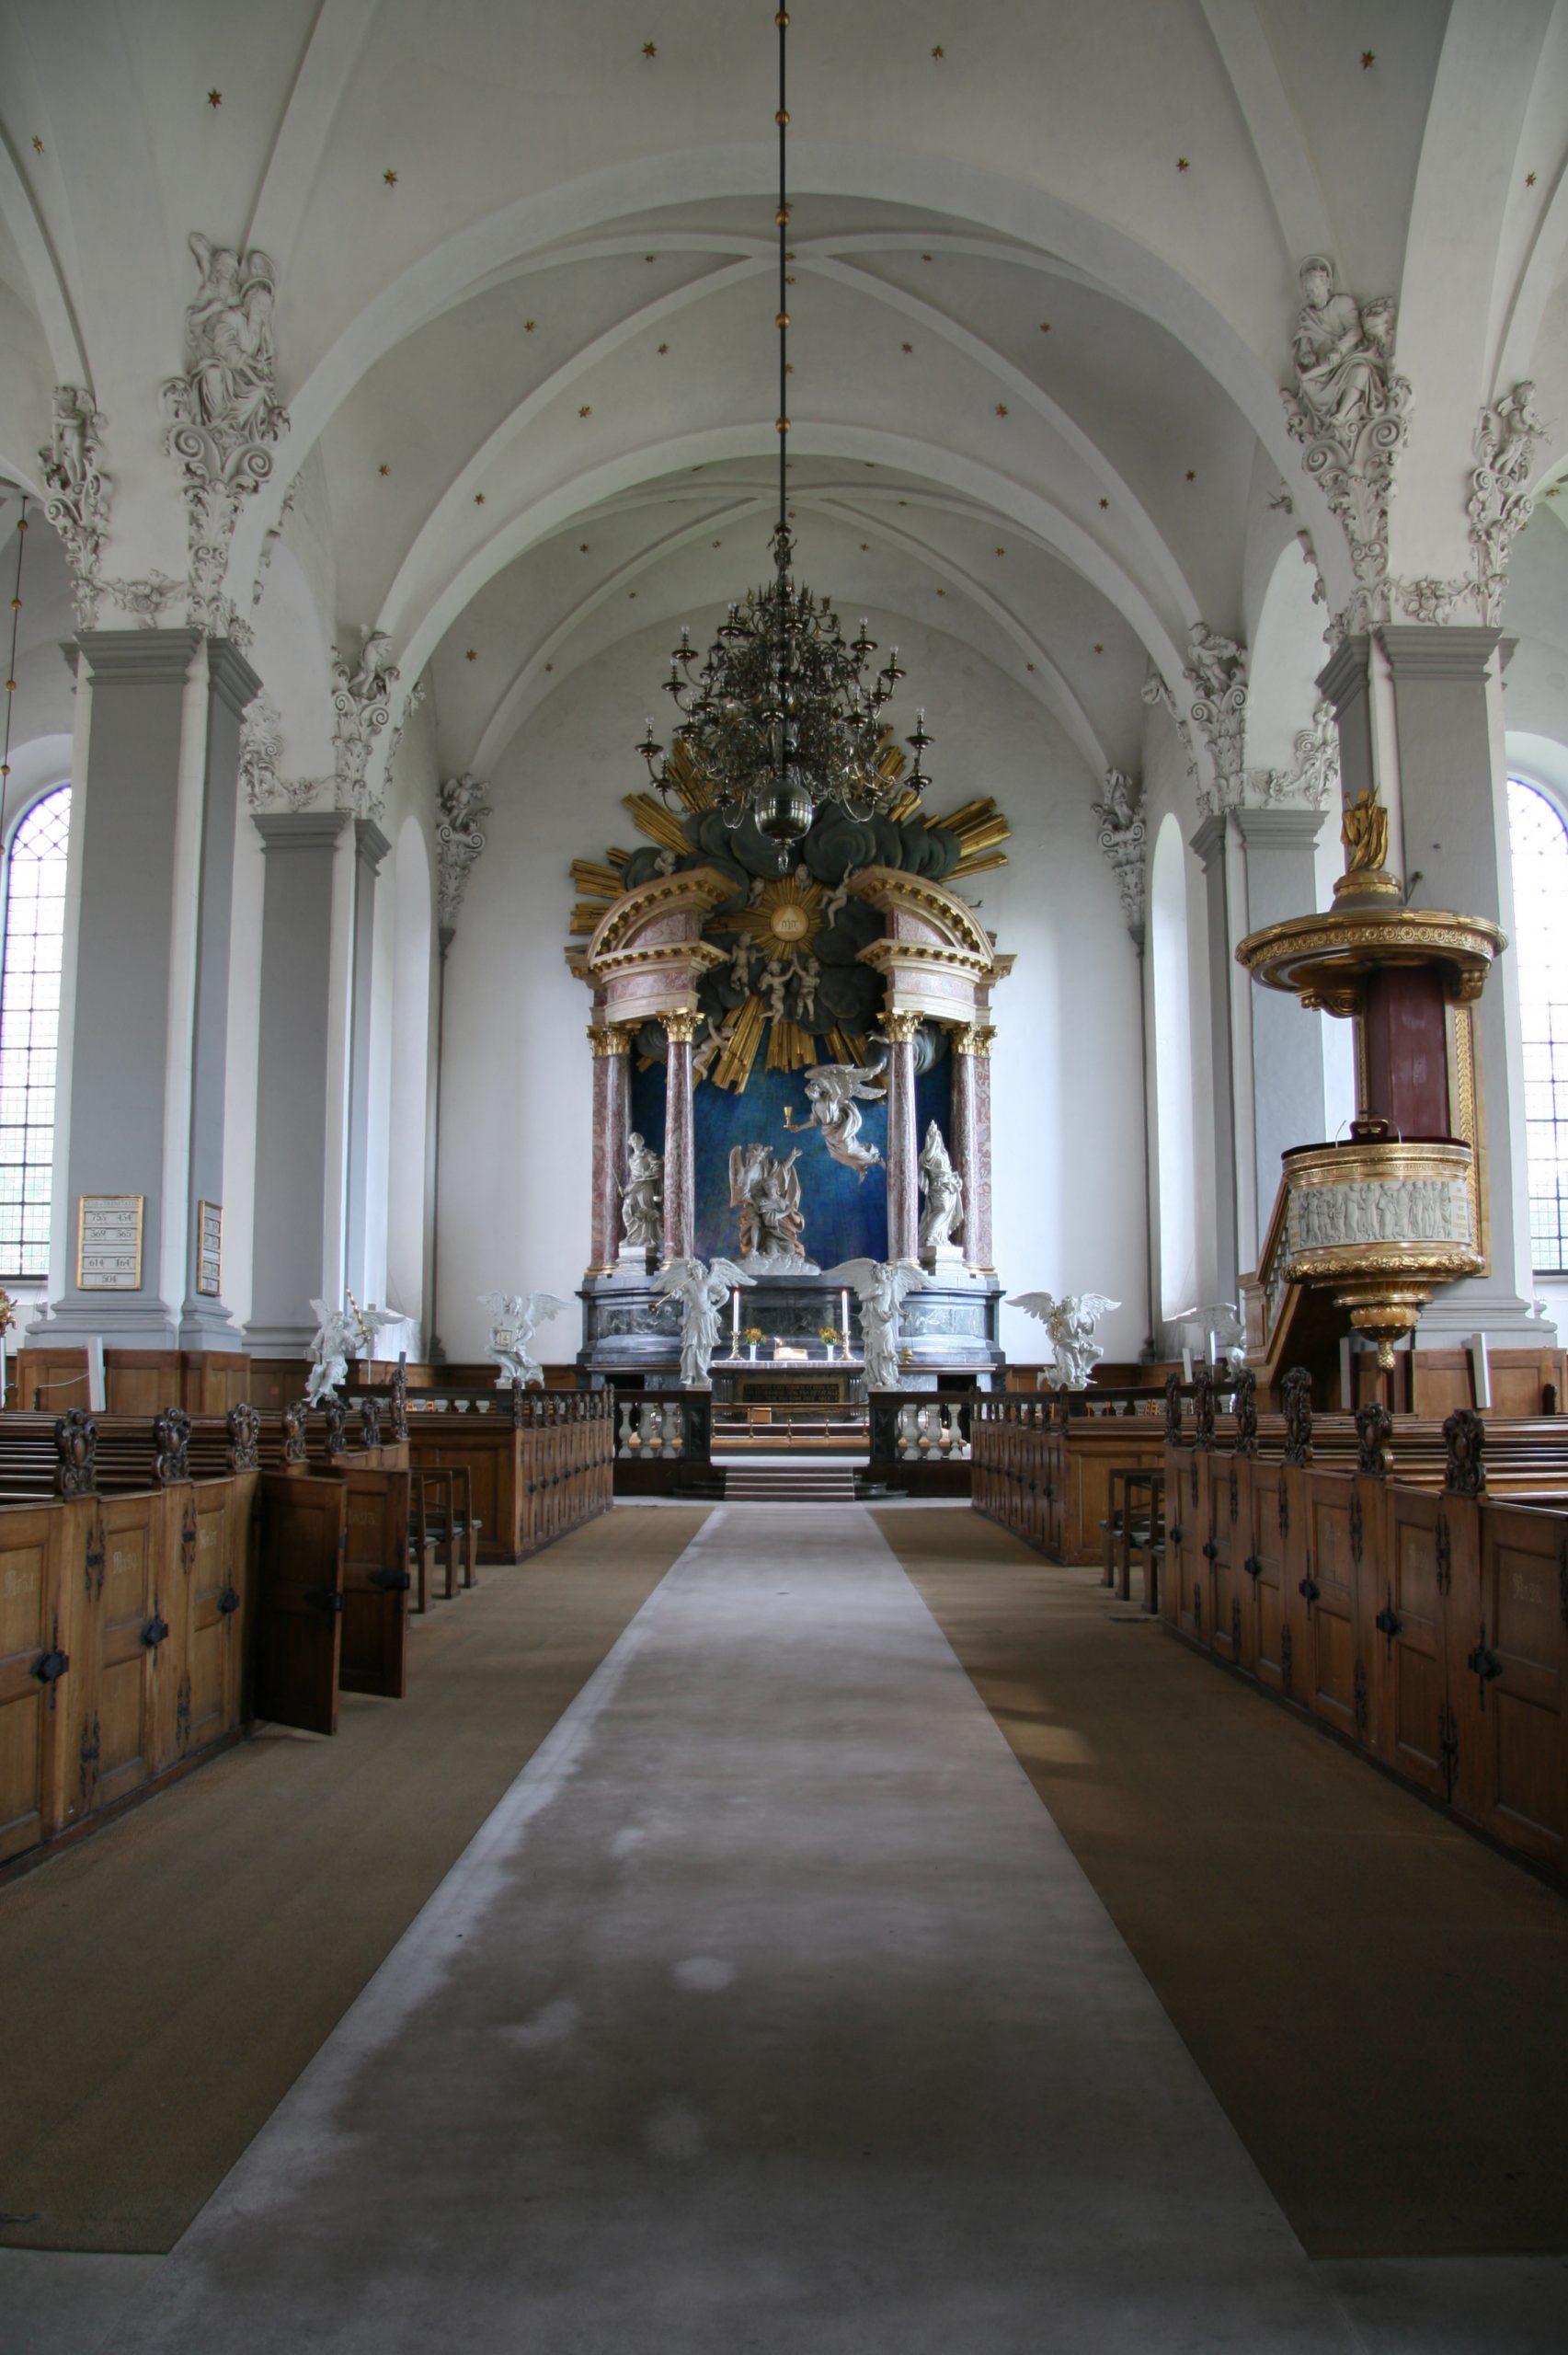 Church of our Saviour - Popular Tourist Destinations in Copenhagen